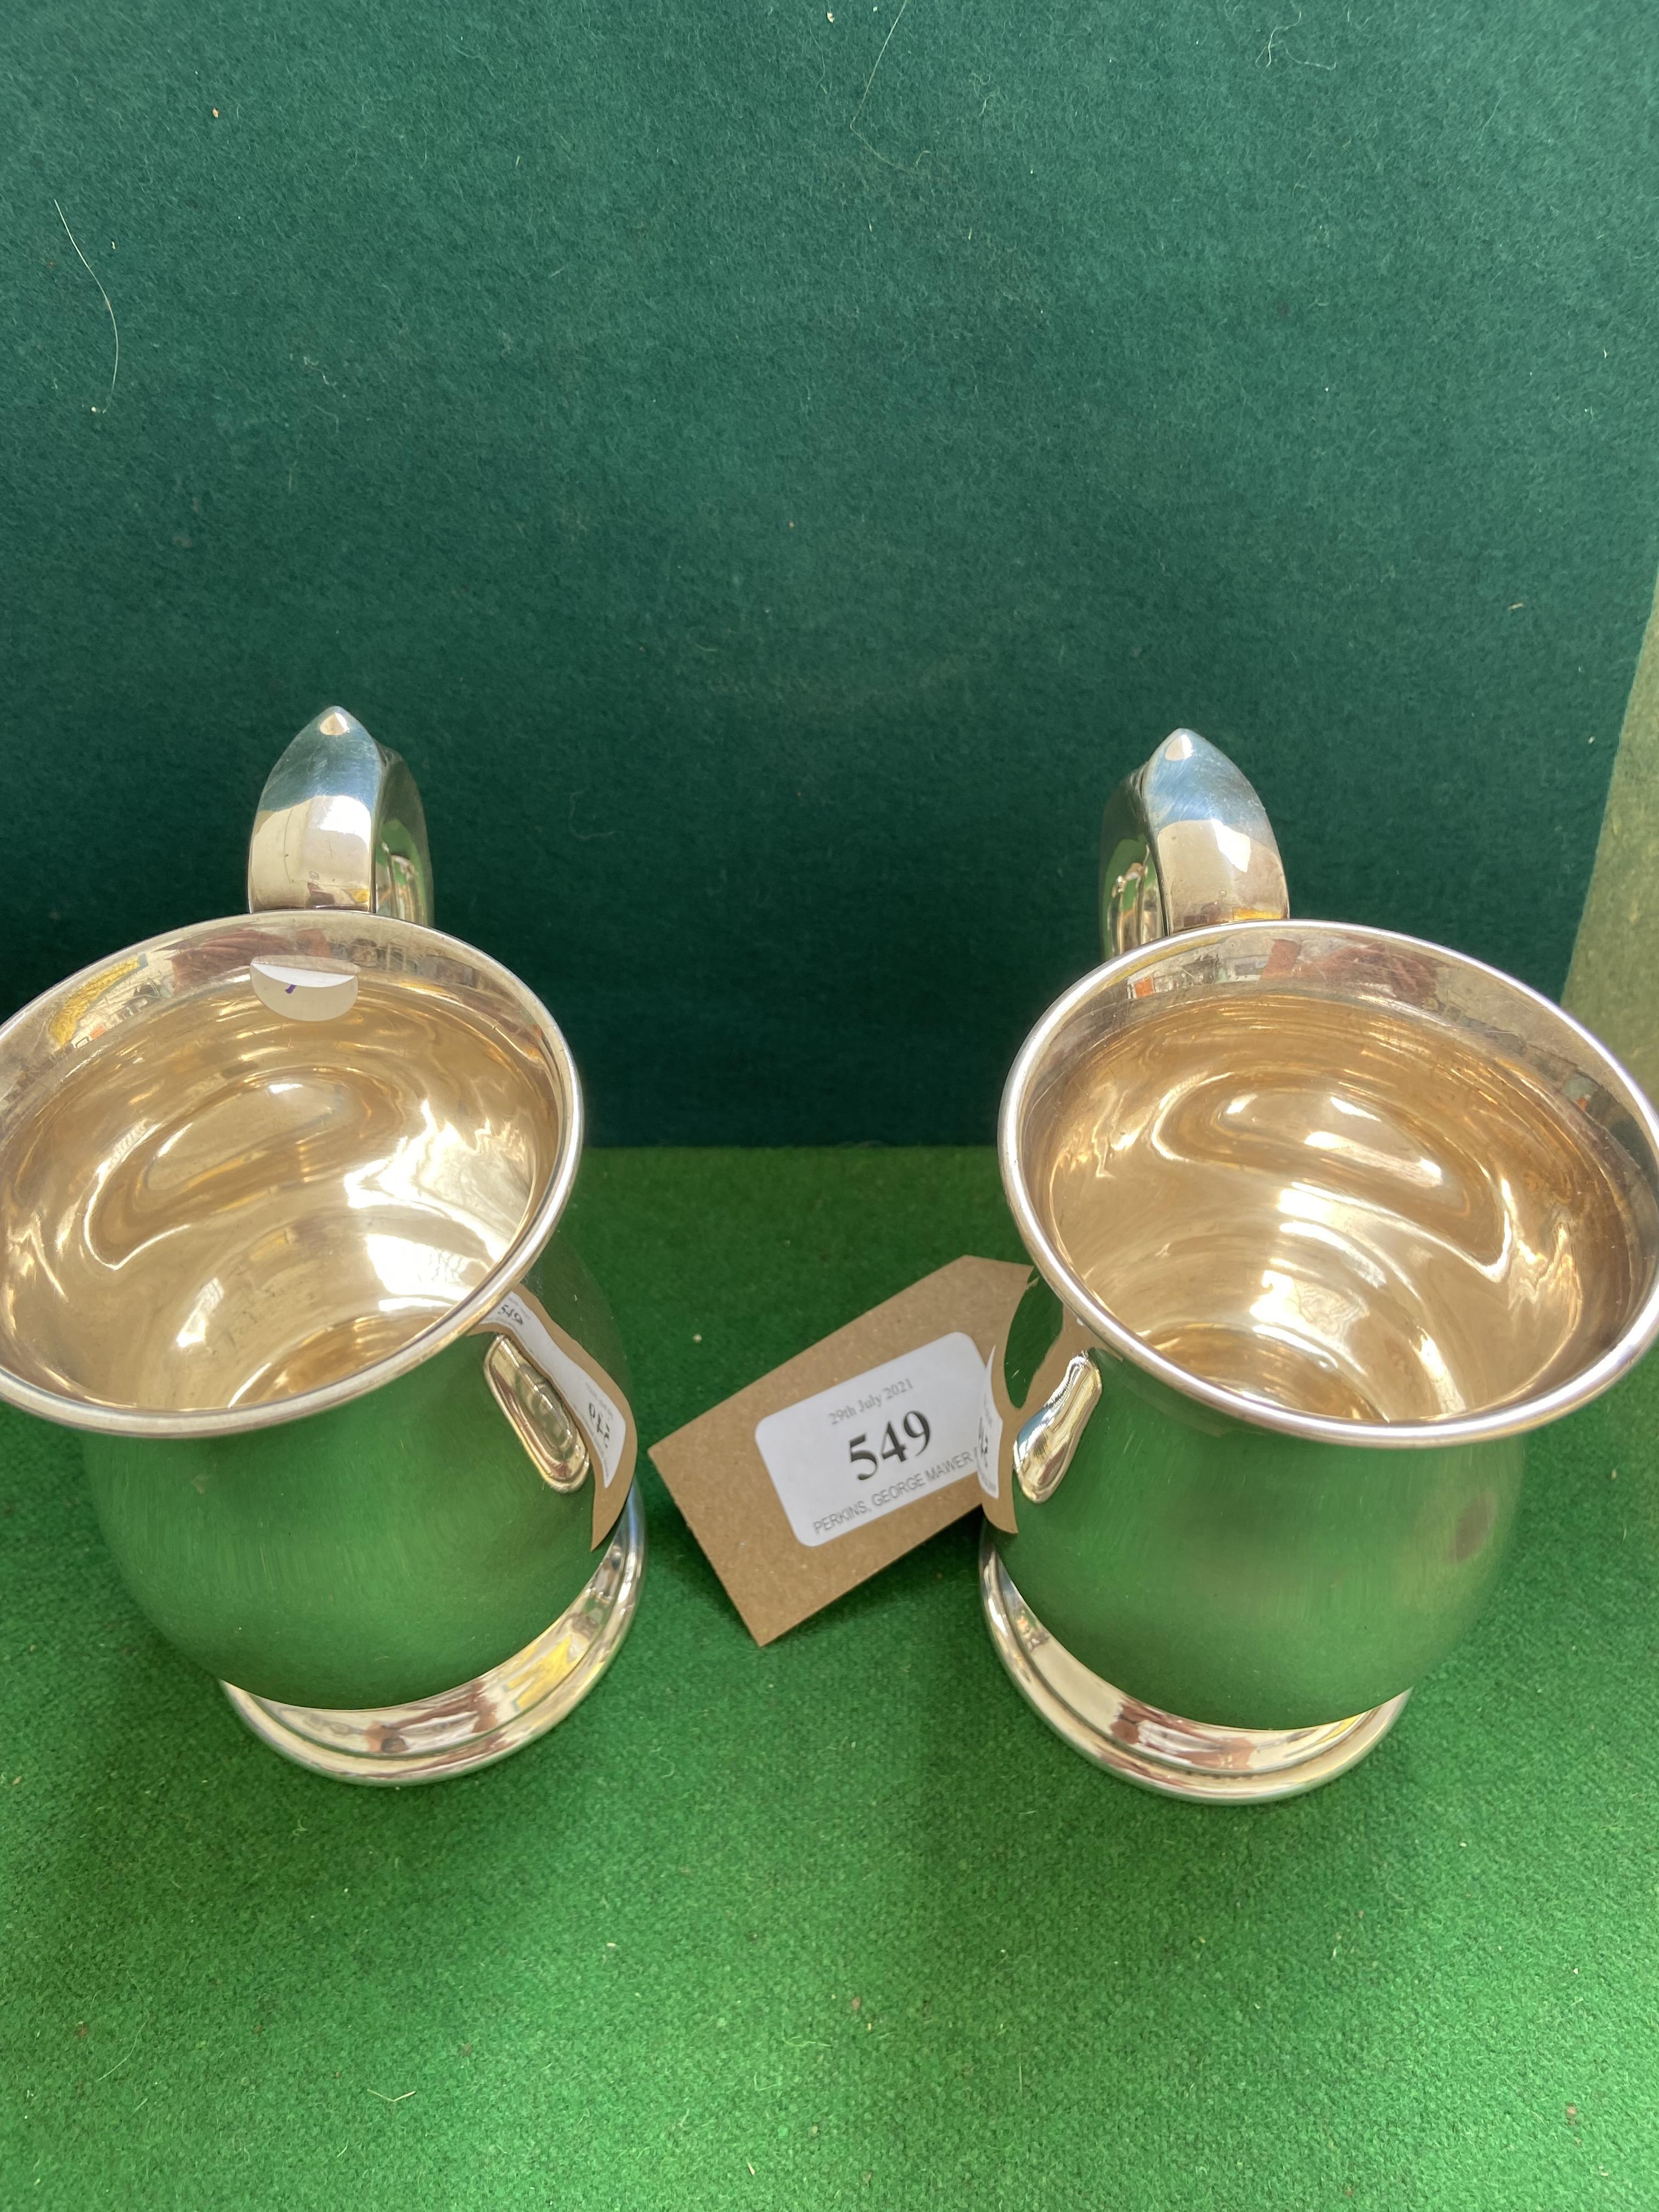 Fine pair of Georgian style silver half pint tankards (Sheffield 1940) (12 3/4 oz. - Image 3 of 3